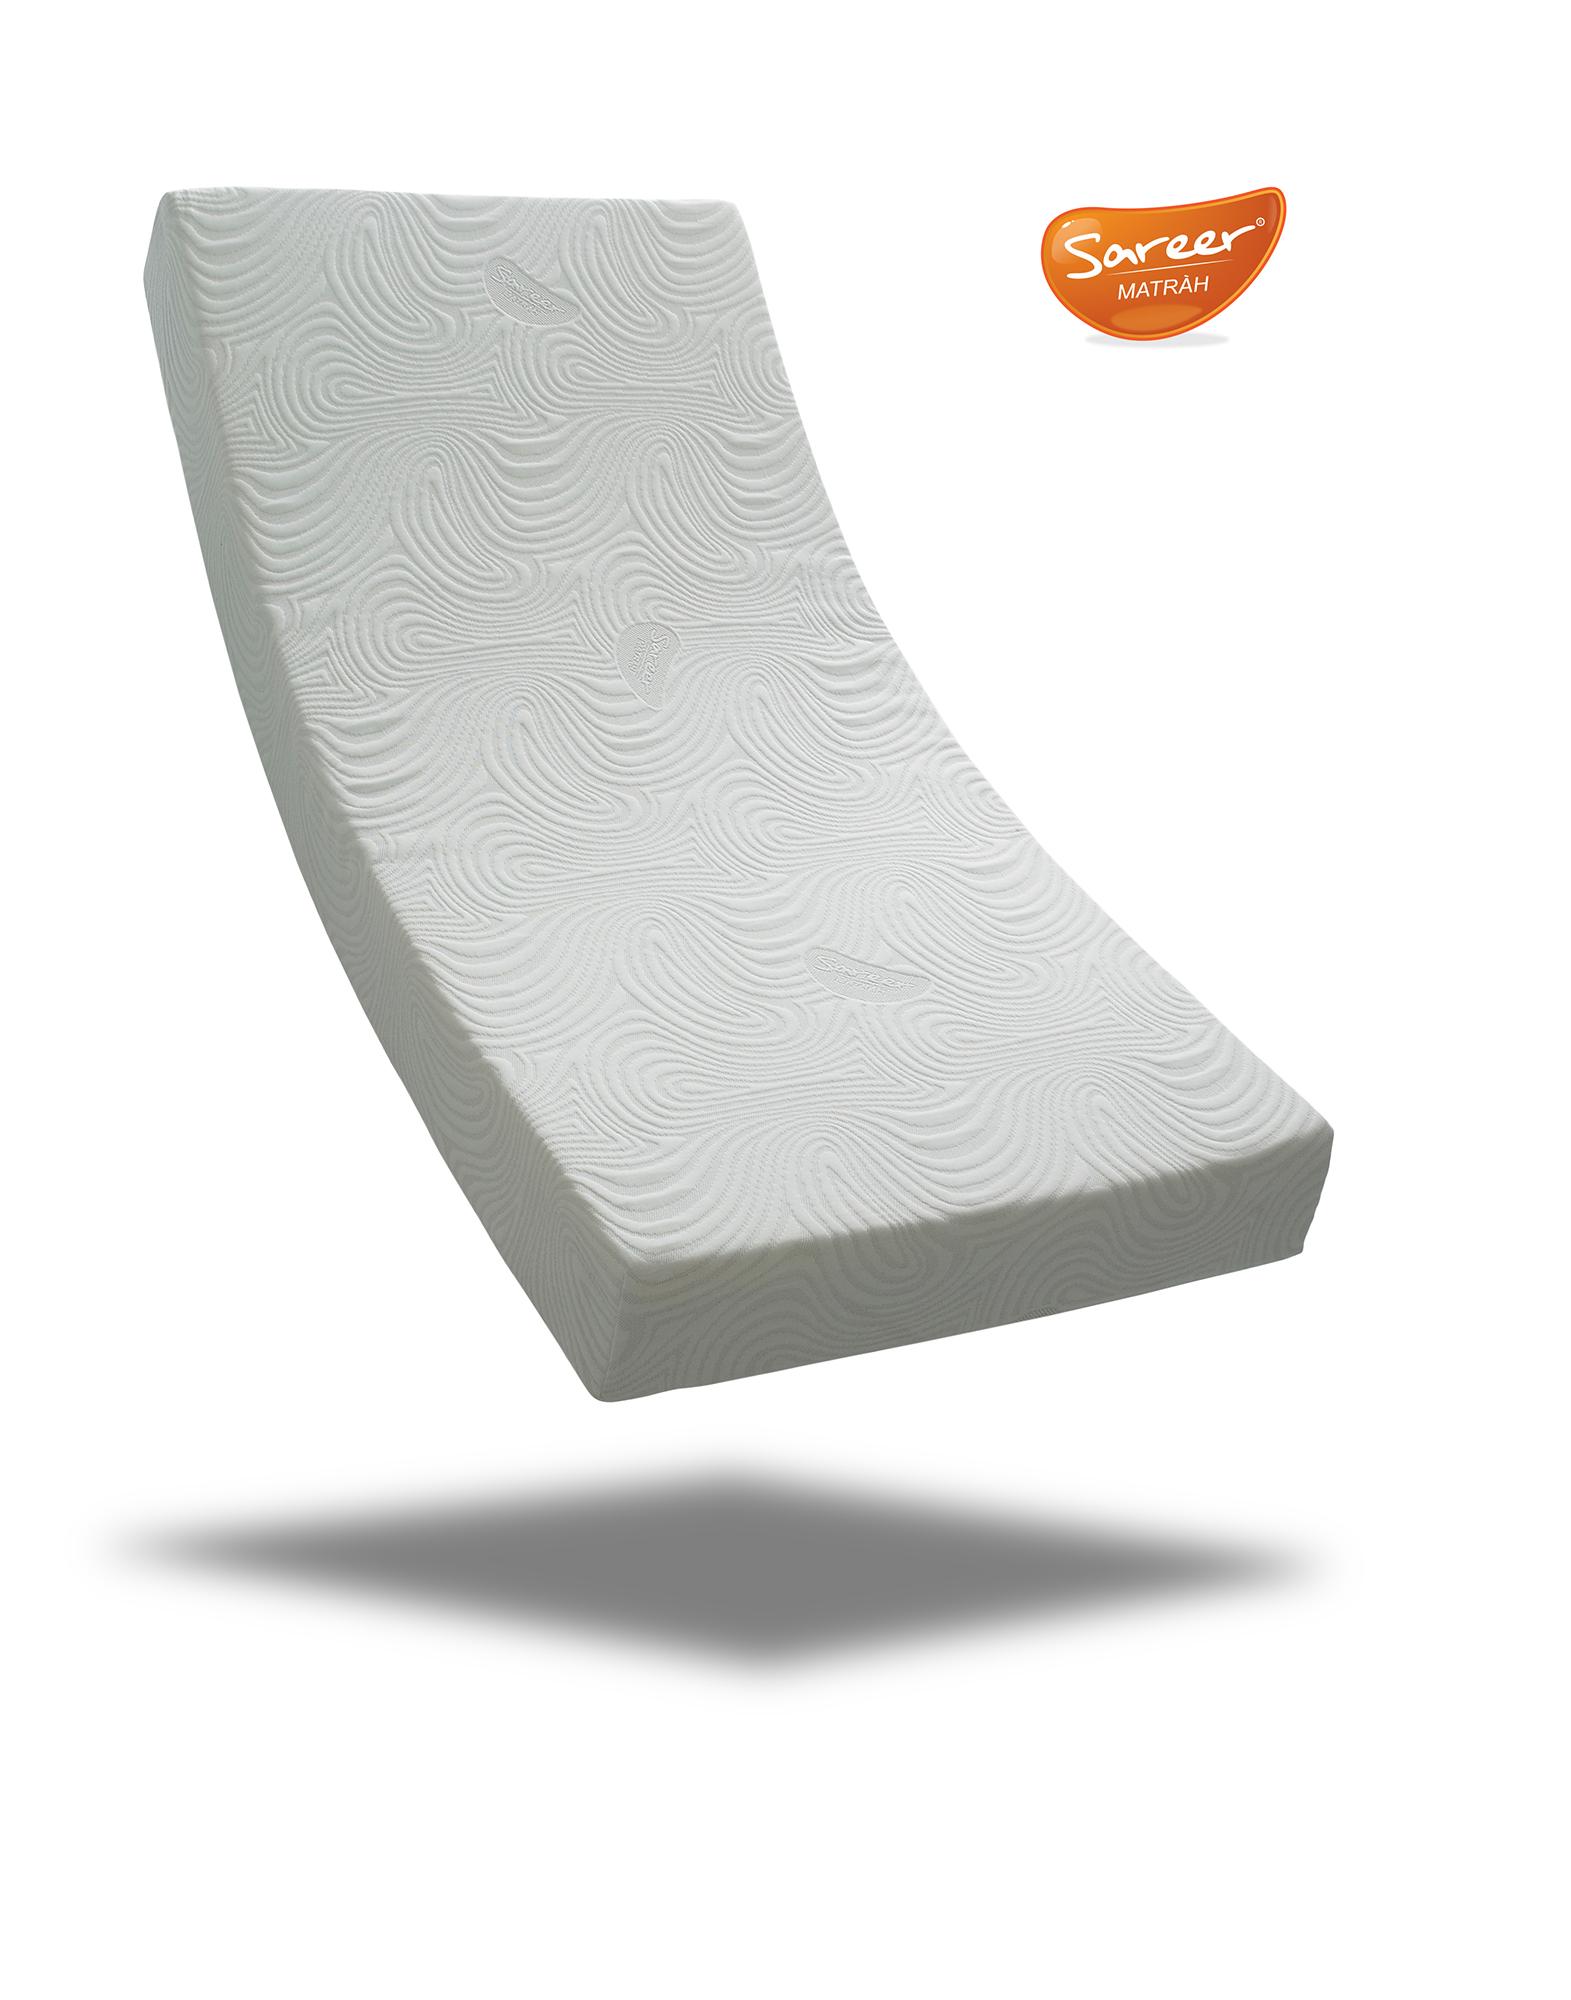 foam topper mattress toppers latex natural luxury comfort process dept sense dunlop solutions htm